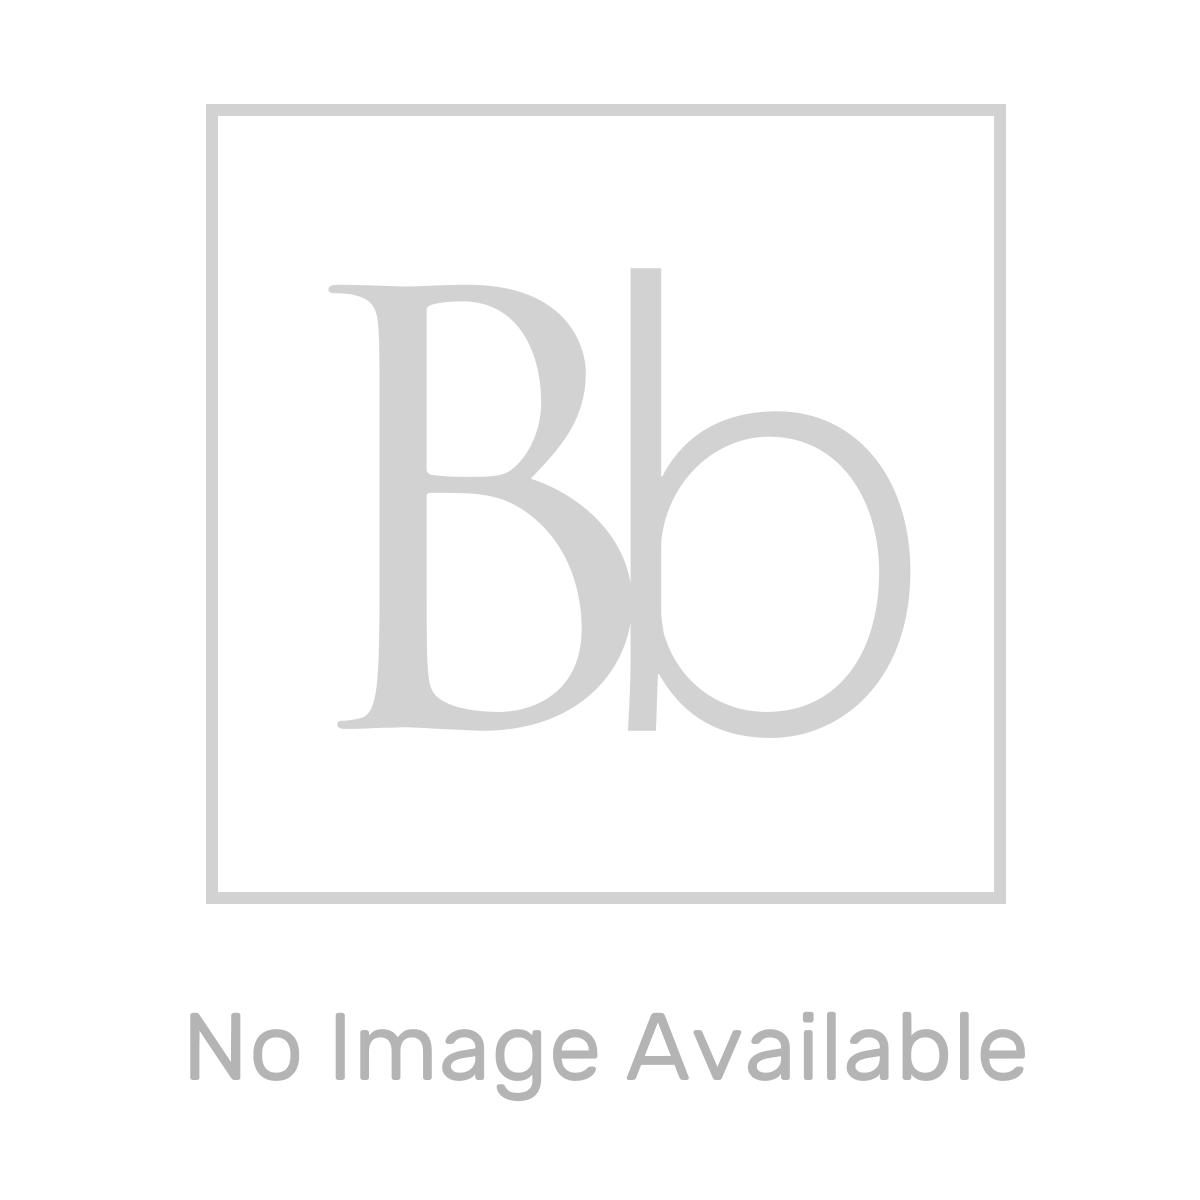 Elation Combination Straight Indigo Matt Furniture Pack 1000mm Dimensions